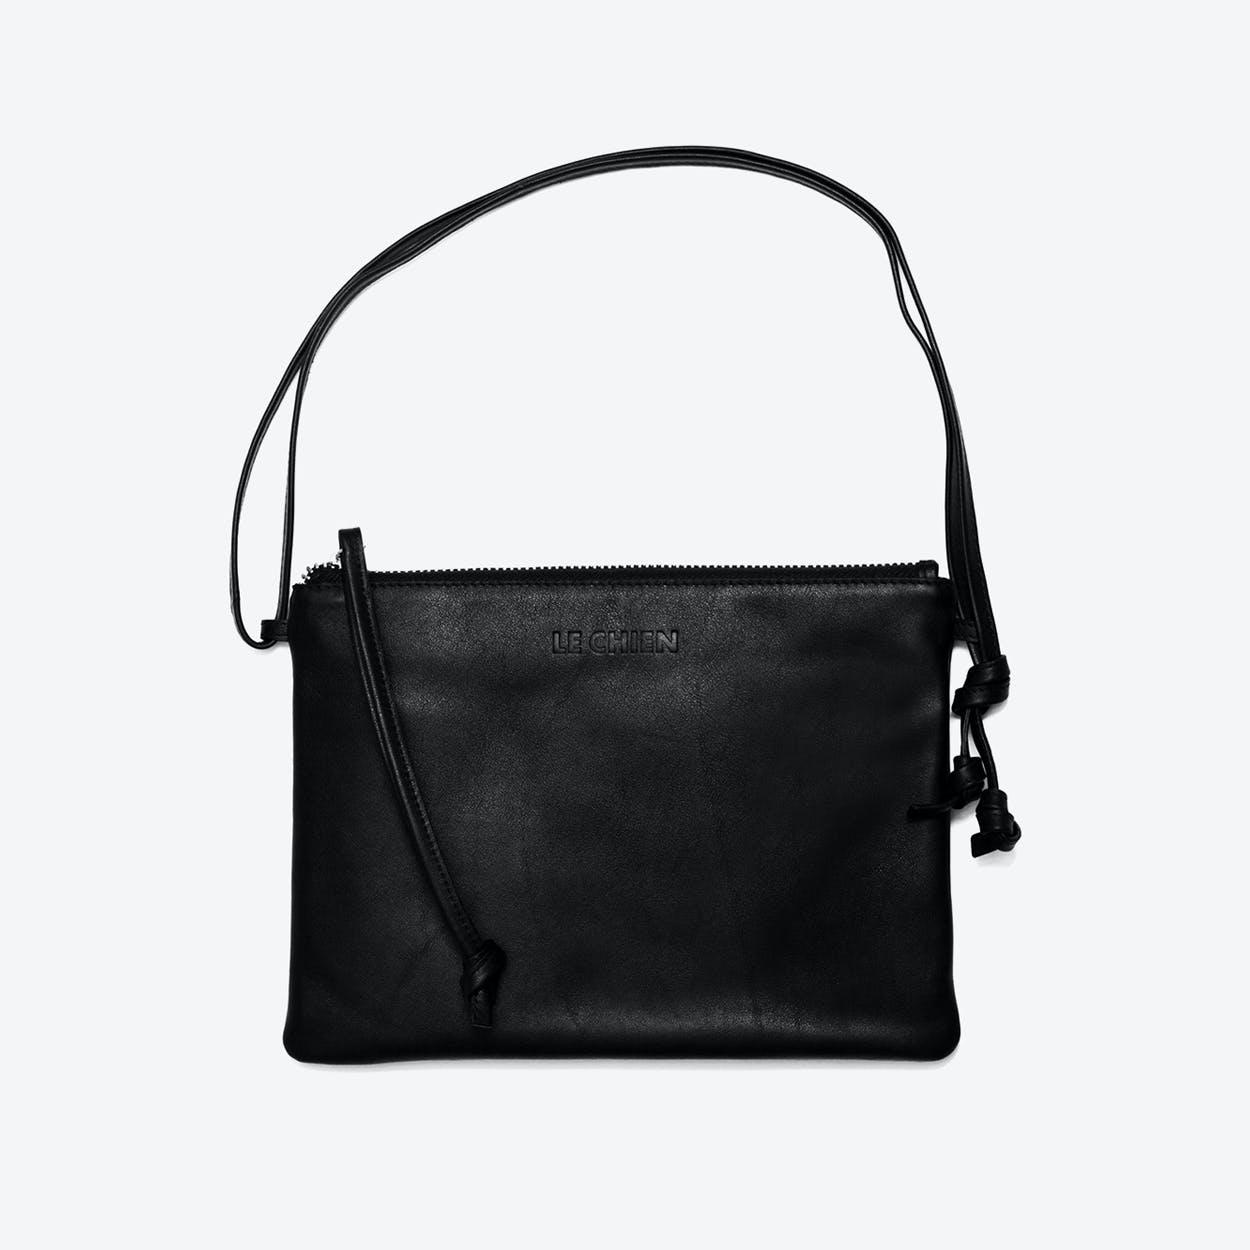 Pinscher Crossbody Bag in Black/Nappa